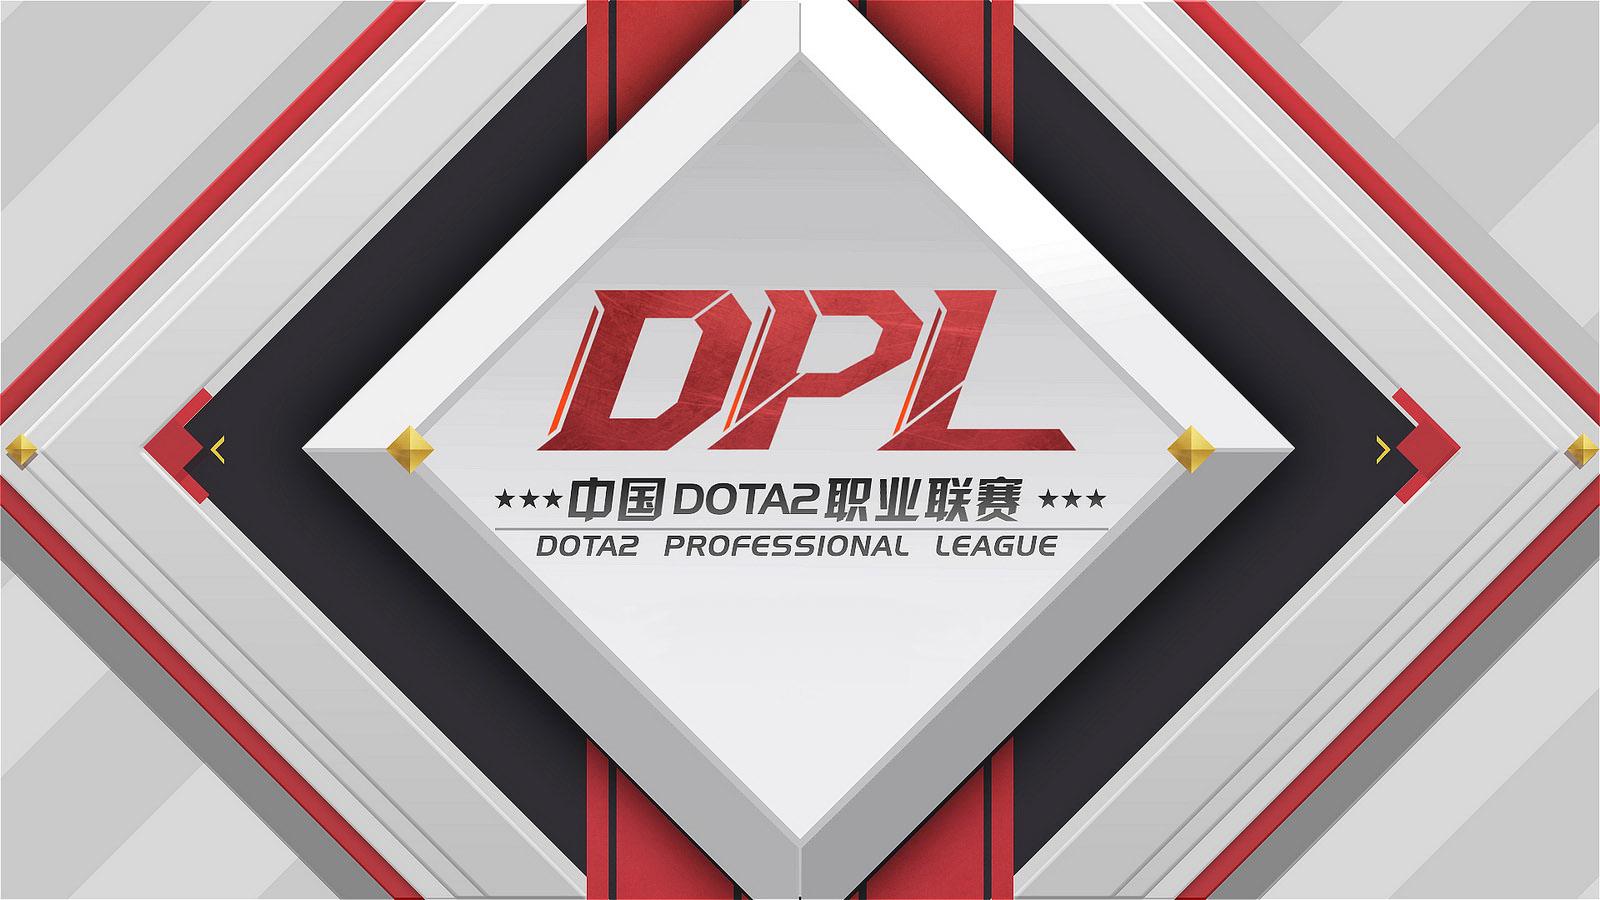 Dota2 professional league new